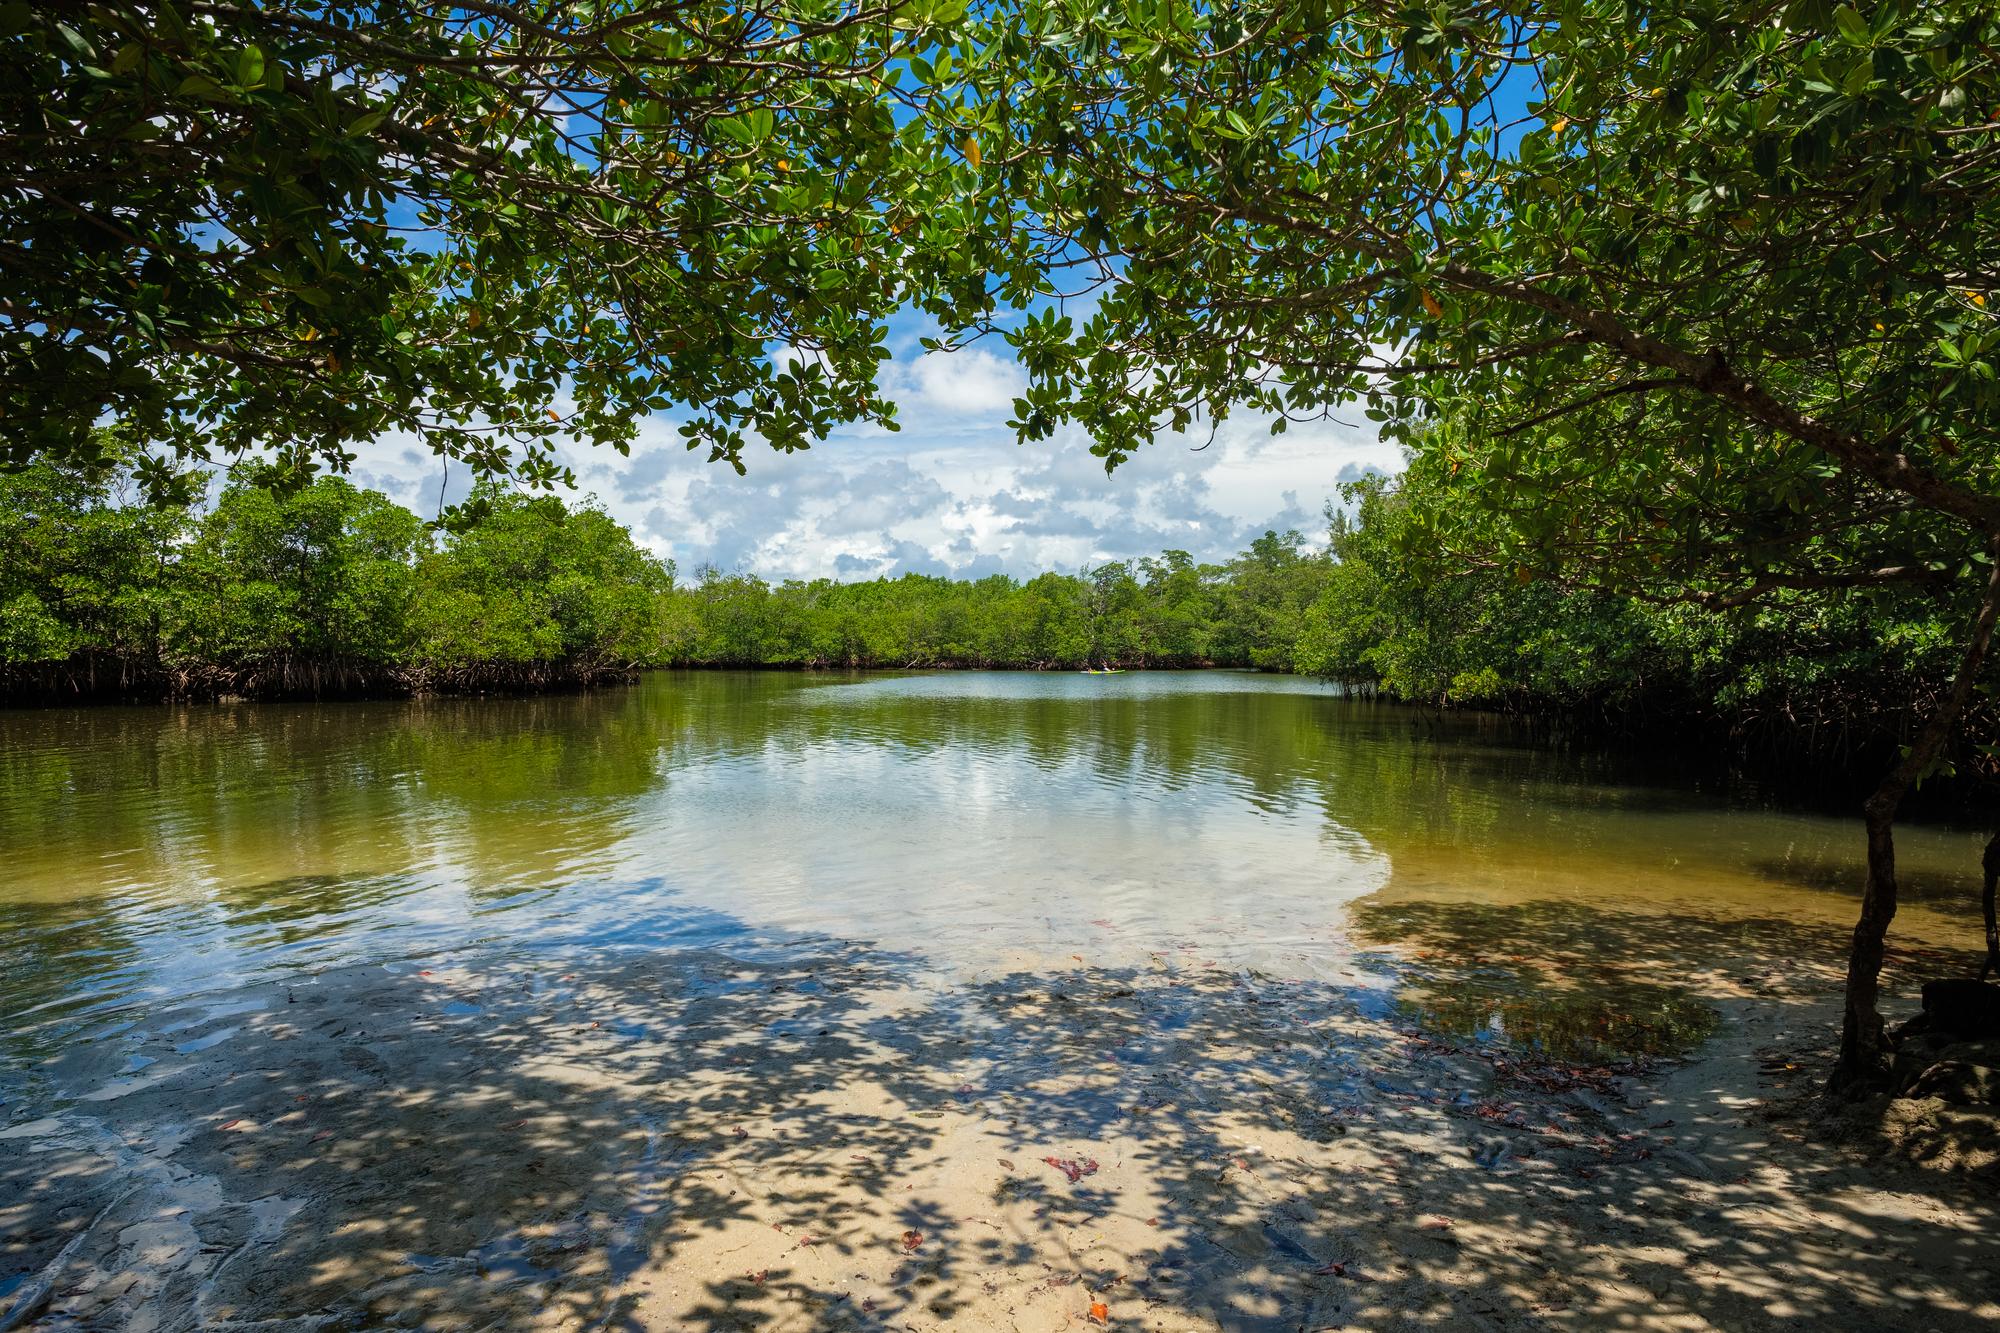 best hikes in Miami - Oleta River State Park